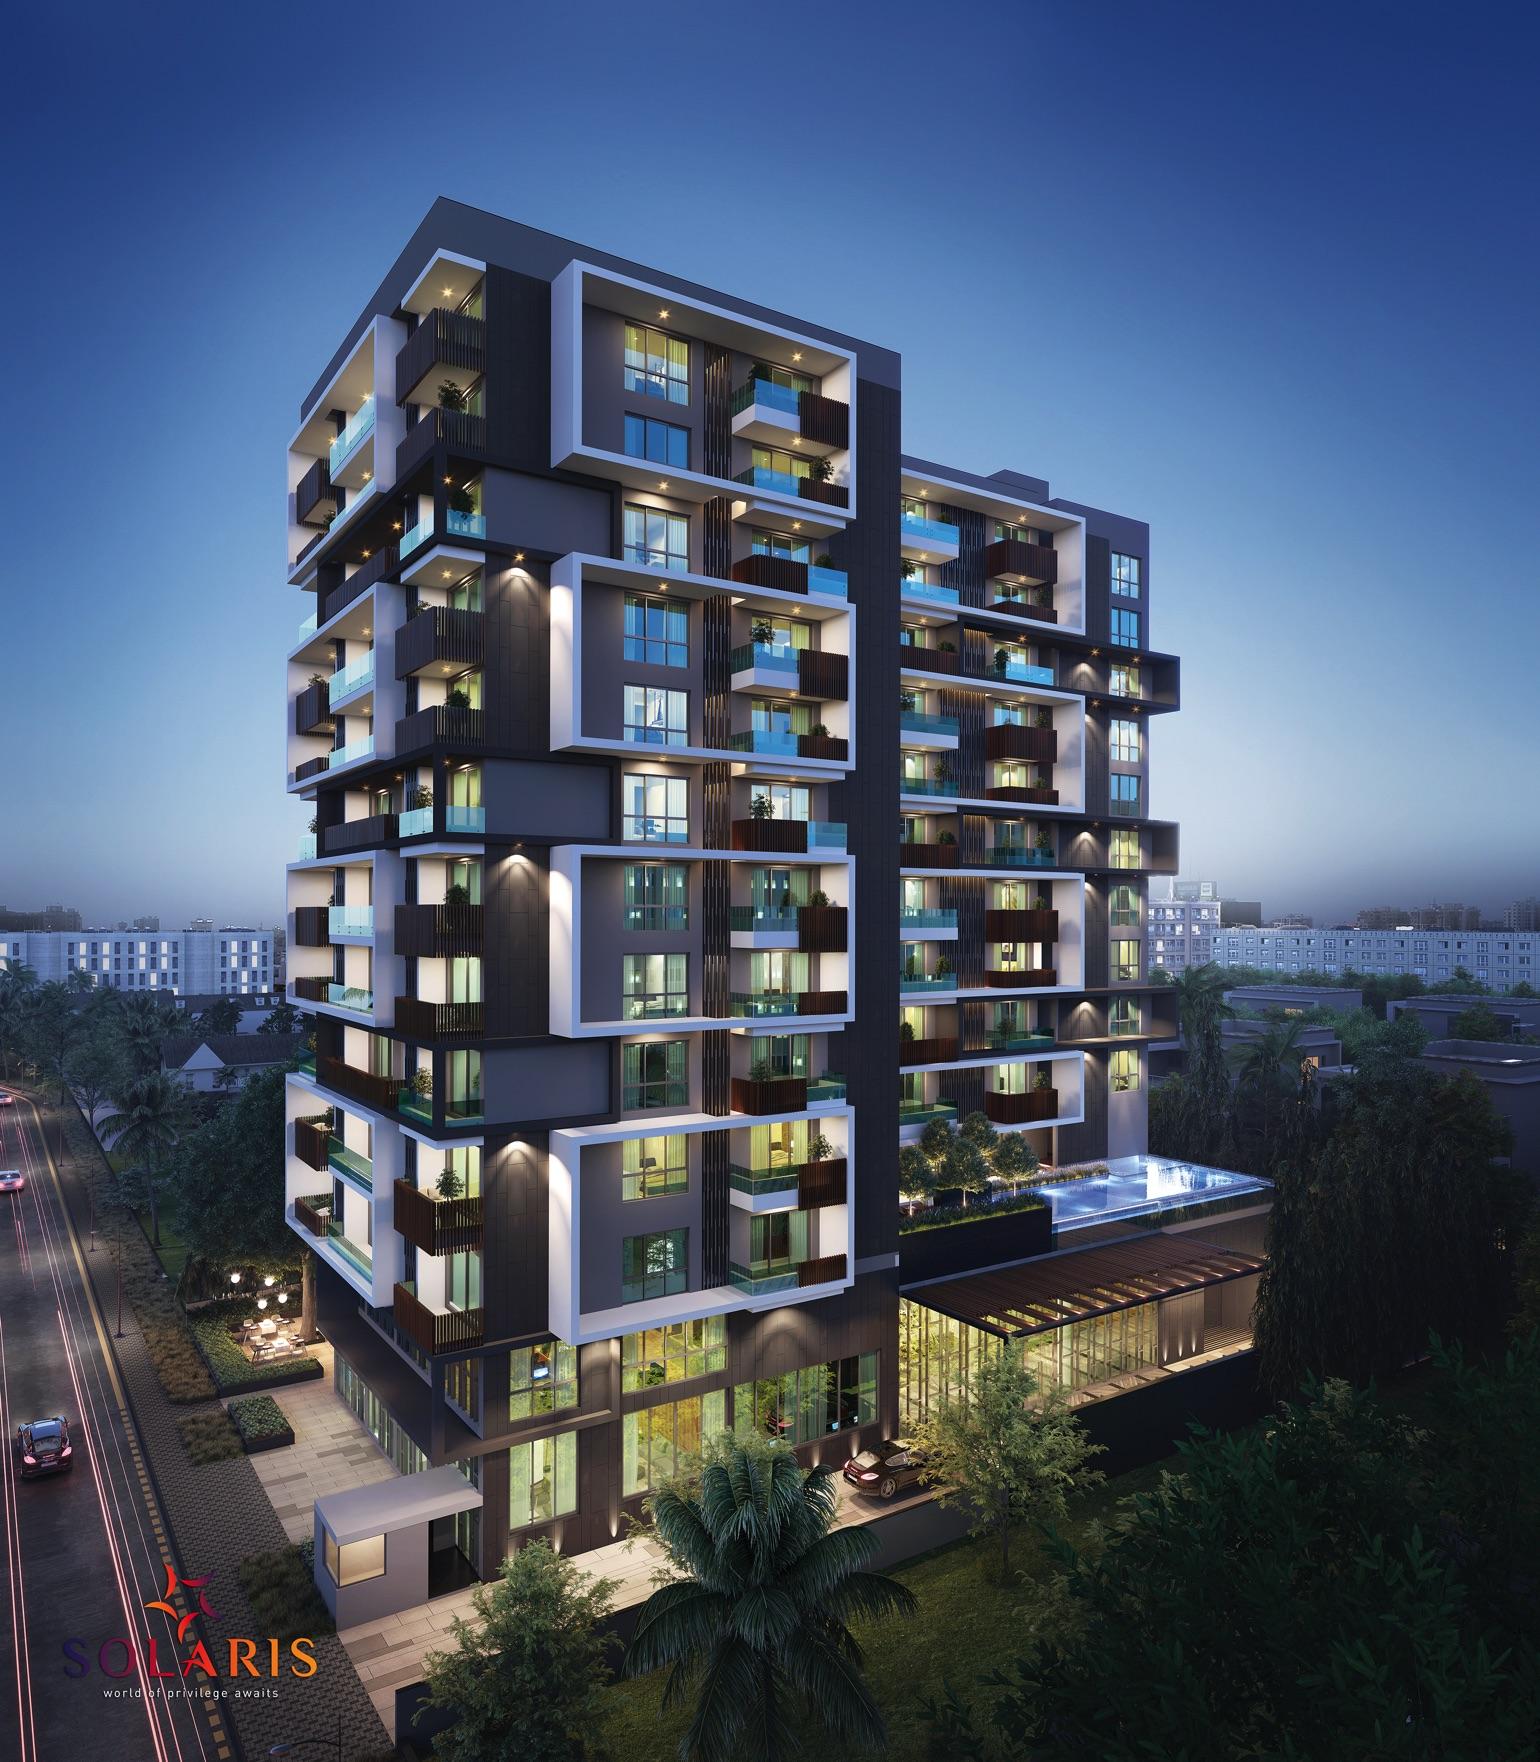 https://swamiindiaghanaltd.com/solaris-apartments/wp-content/uploads/2021/02/2.jpg